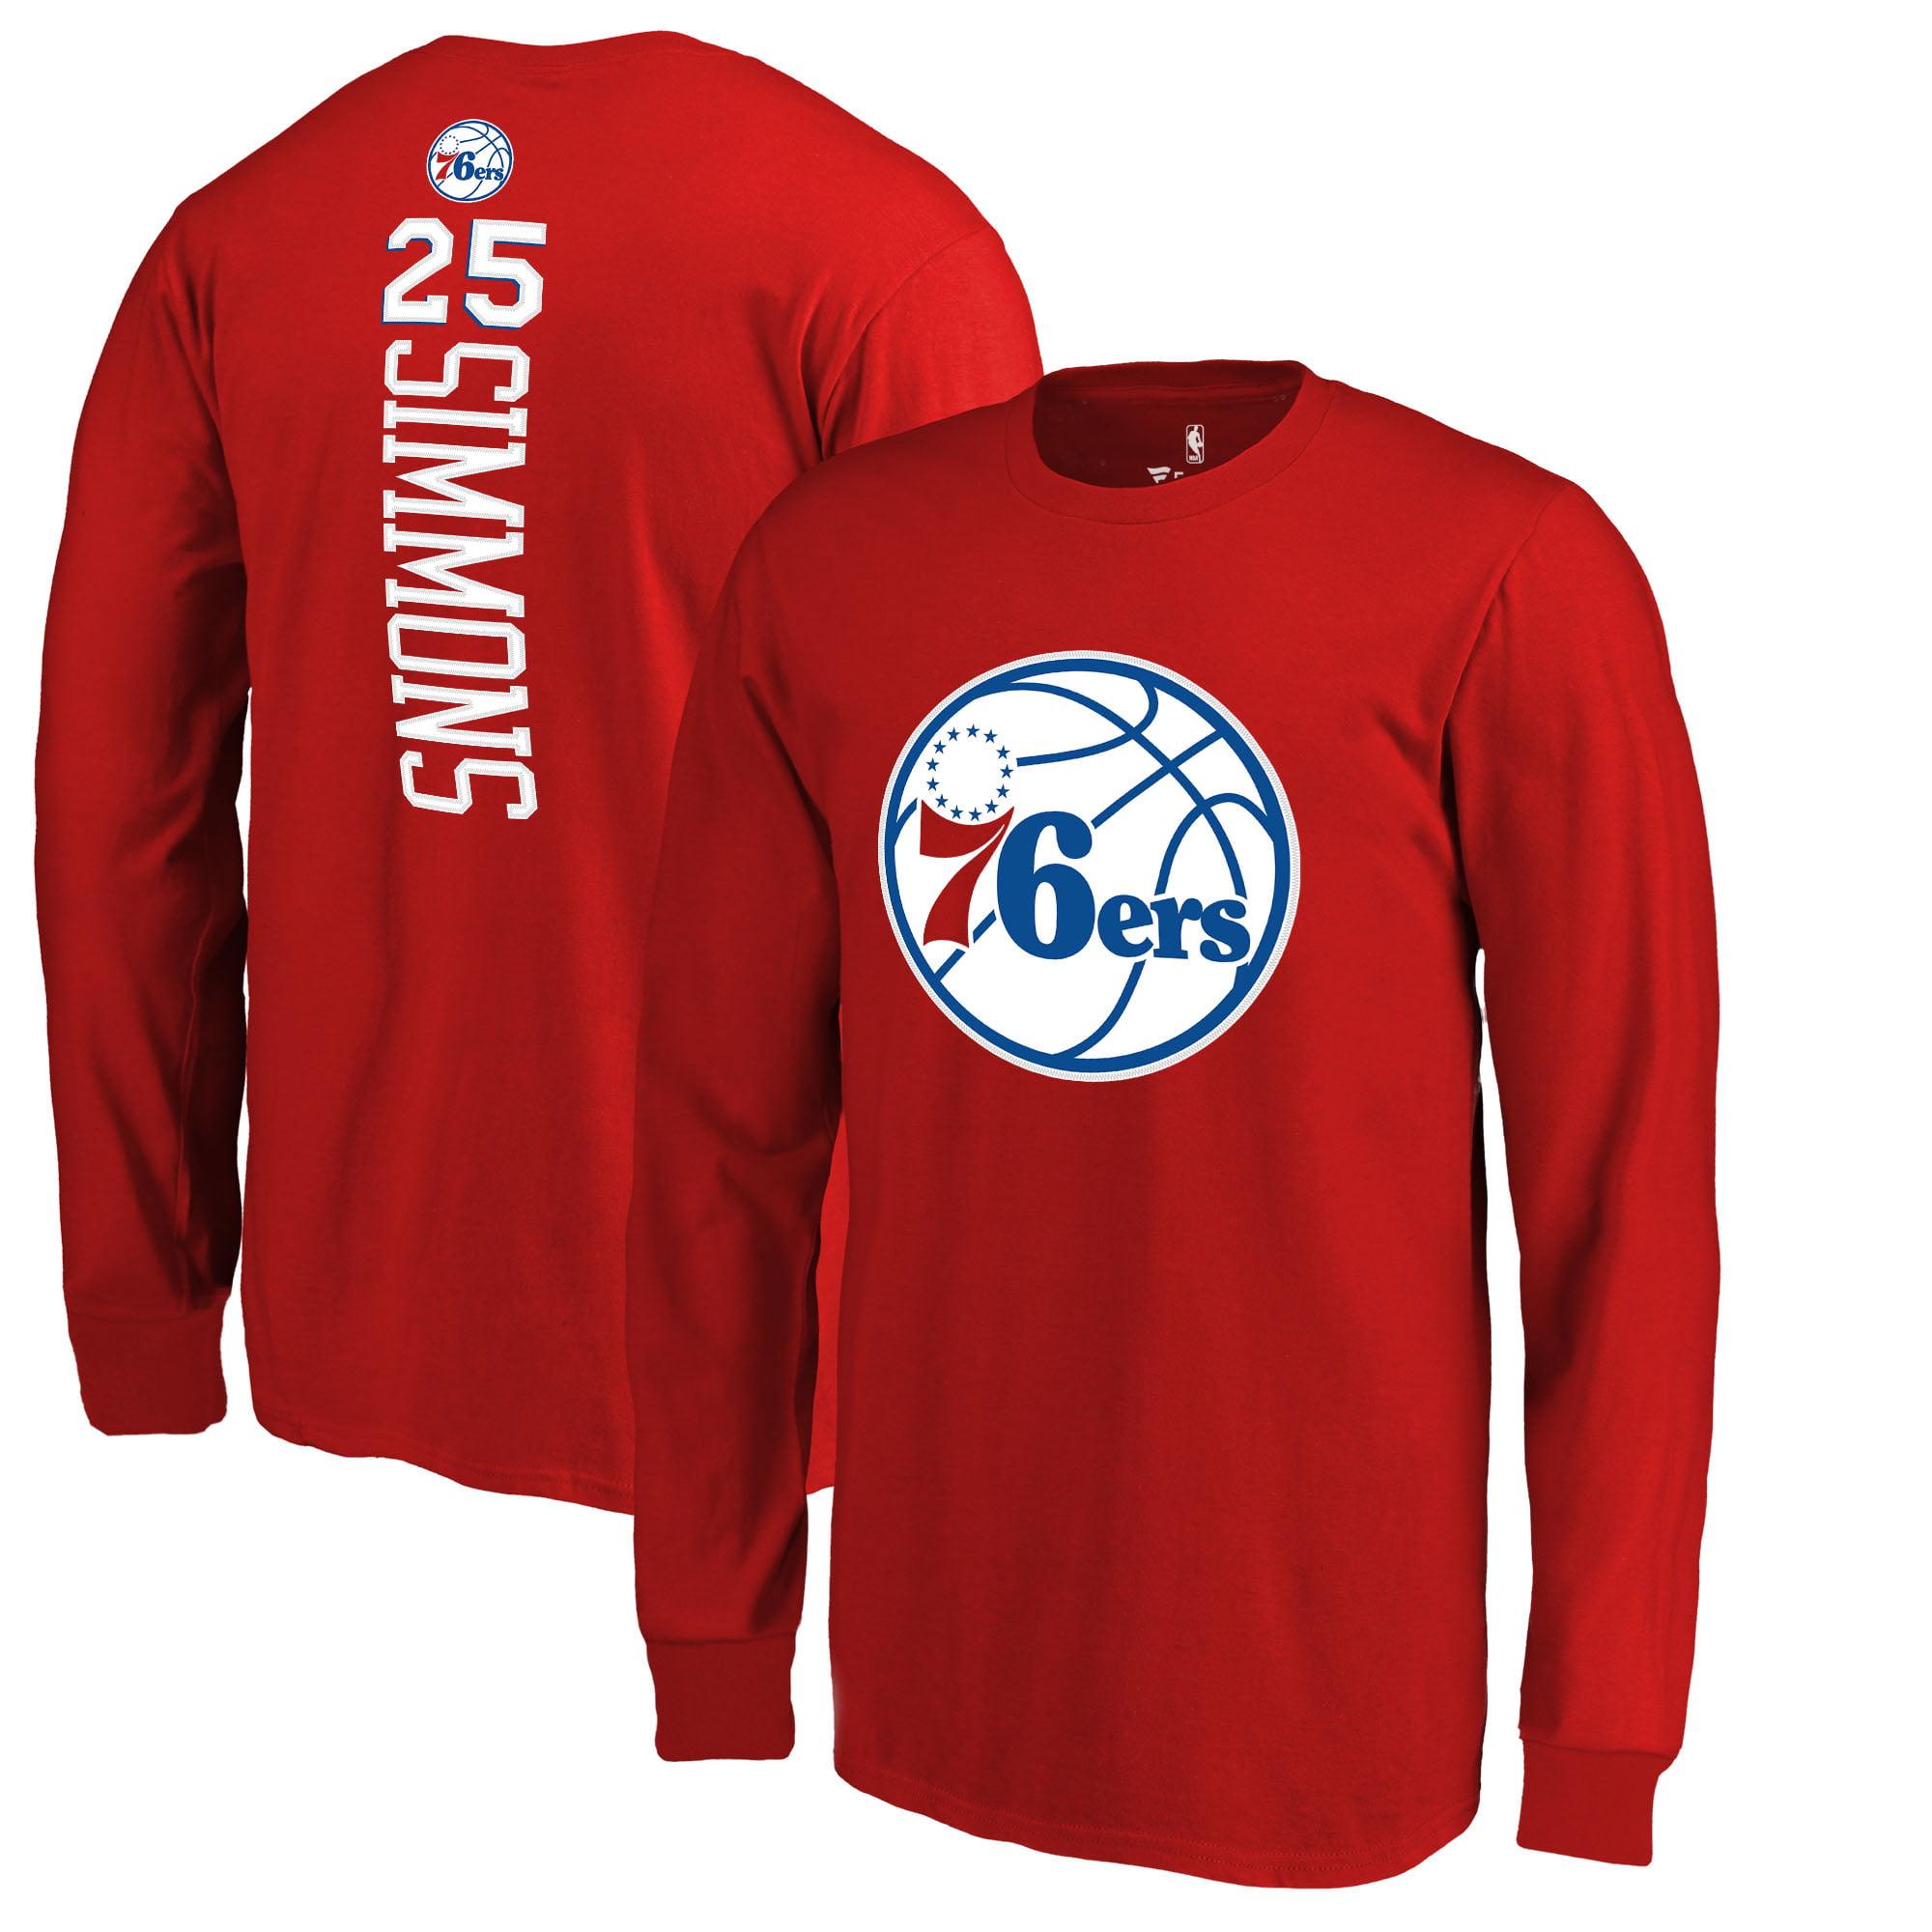 Ben Simmons Philadelphia 76ers Fanatics Branded Youth Team Backer Name & Number Long Sleeve T-Shirt - Red